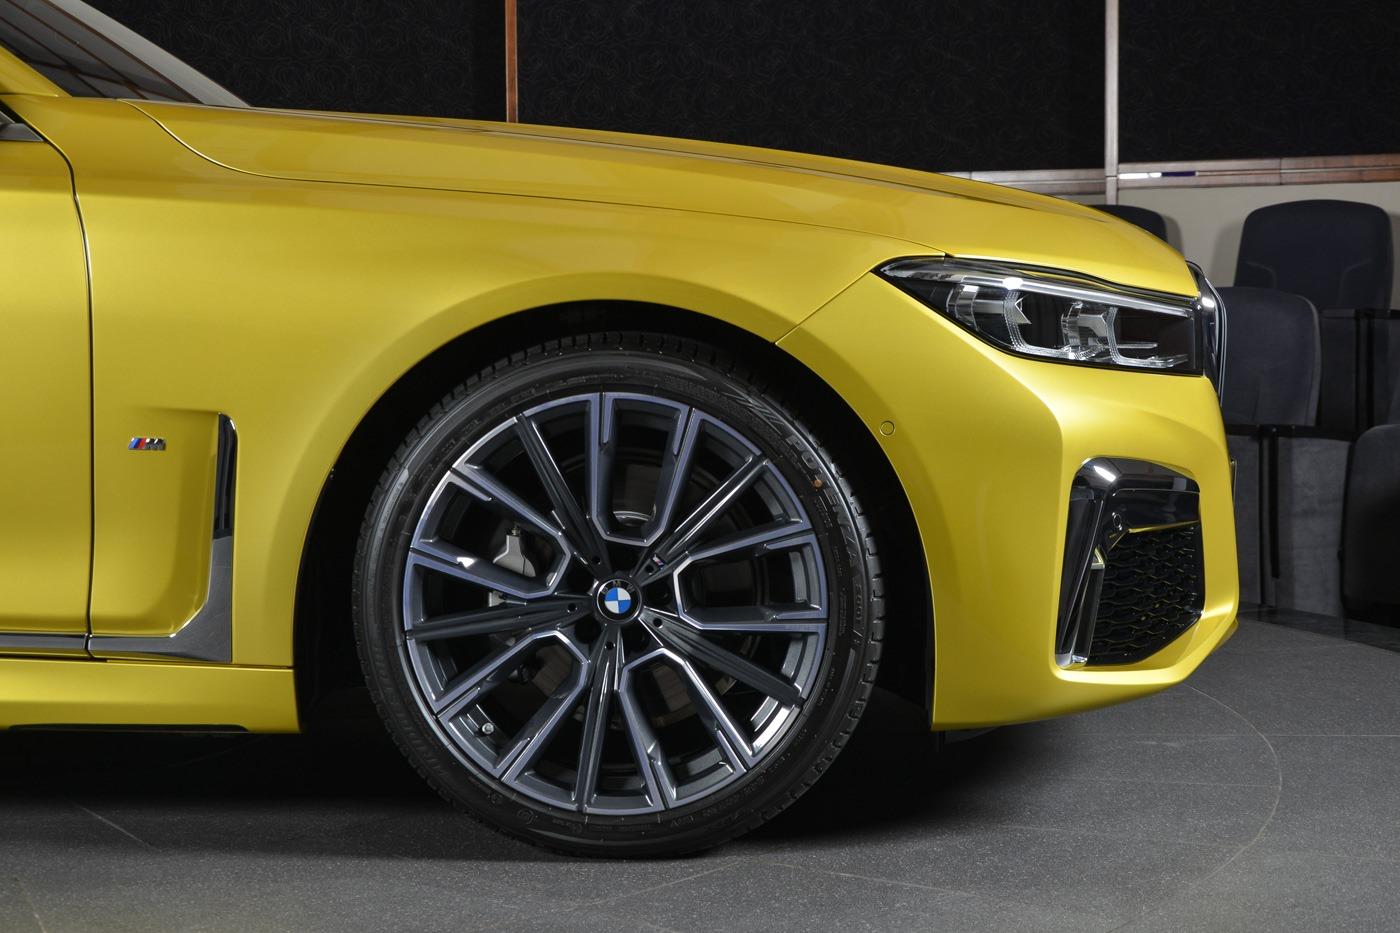 BMW-7-Series-730Li-M-Sport-Package-in-Austin-Yellow-5